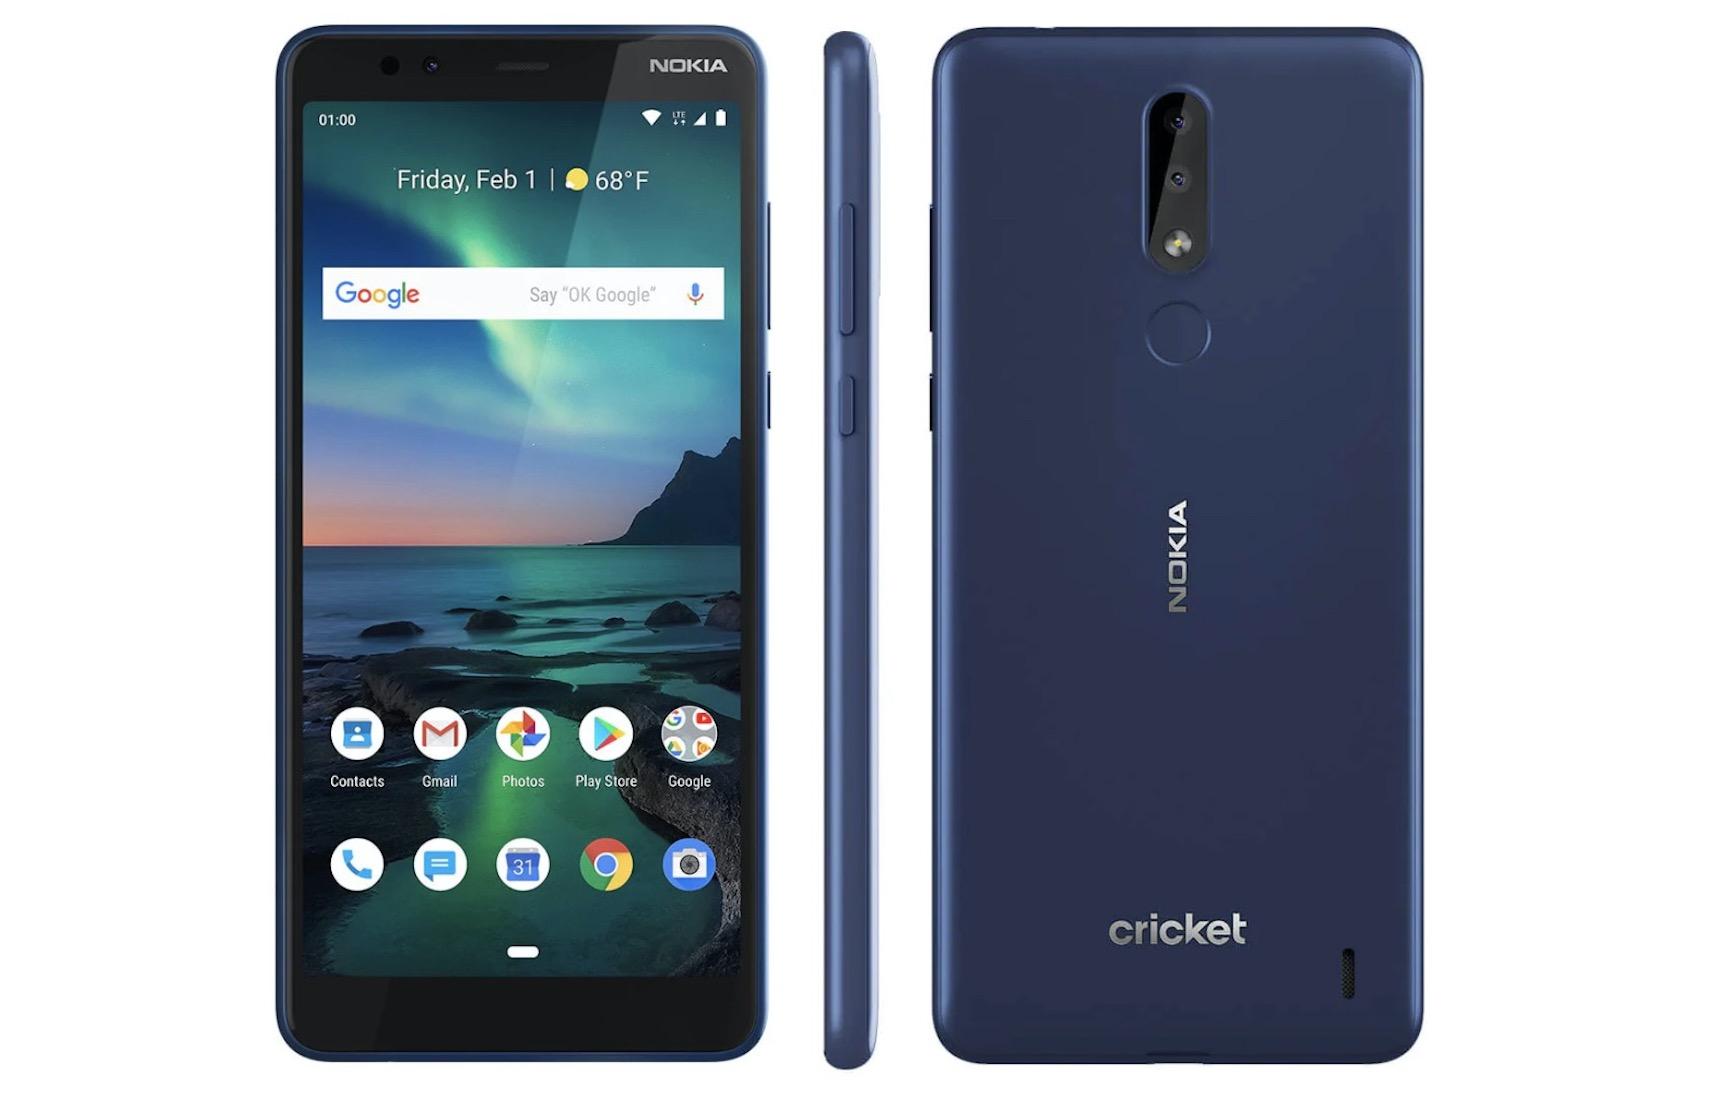 Best Android Phones Under 100 2020